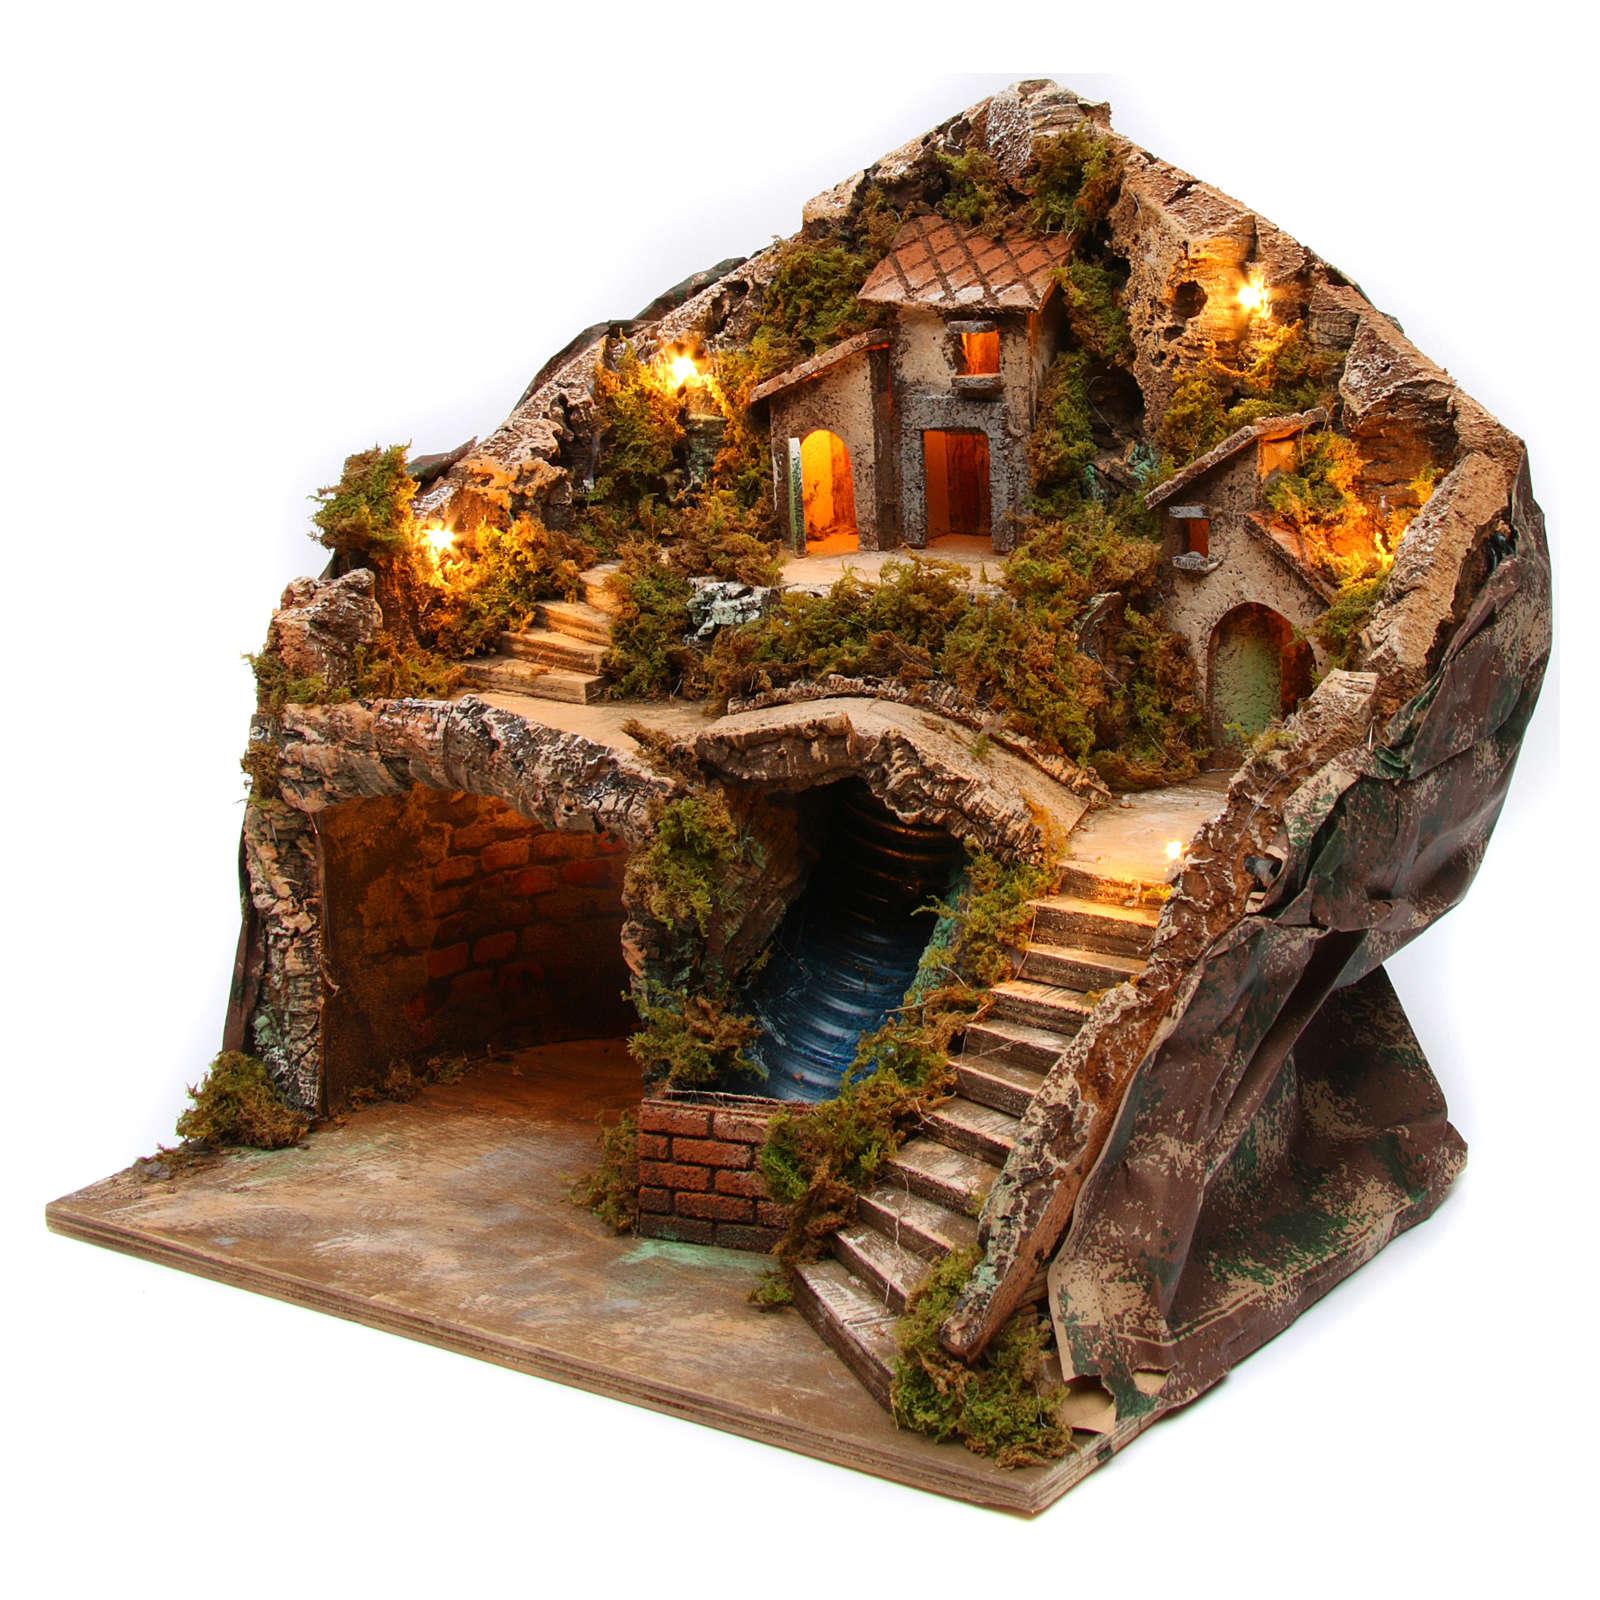 Borgo presepe con ponte e cascata 35x40x30 cm presepe napoletano 4